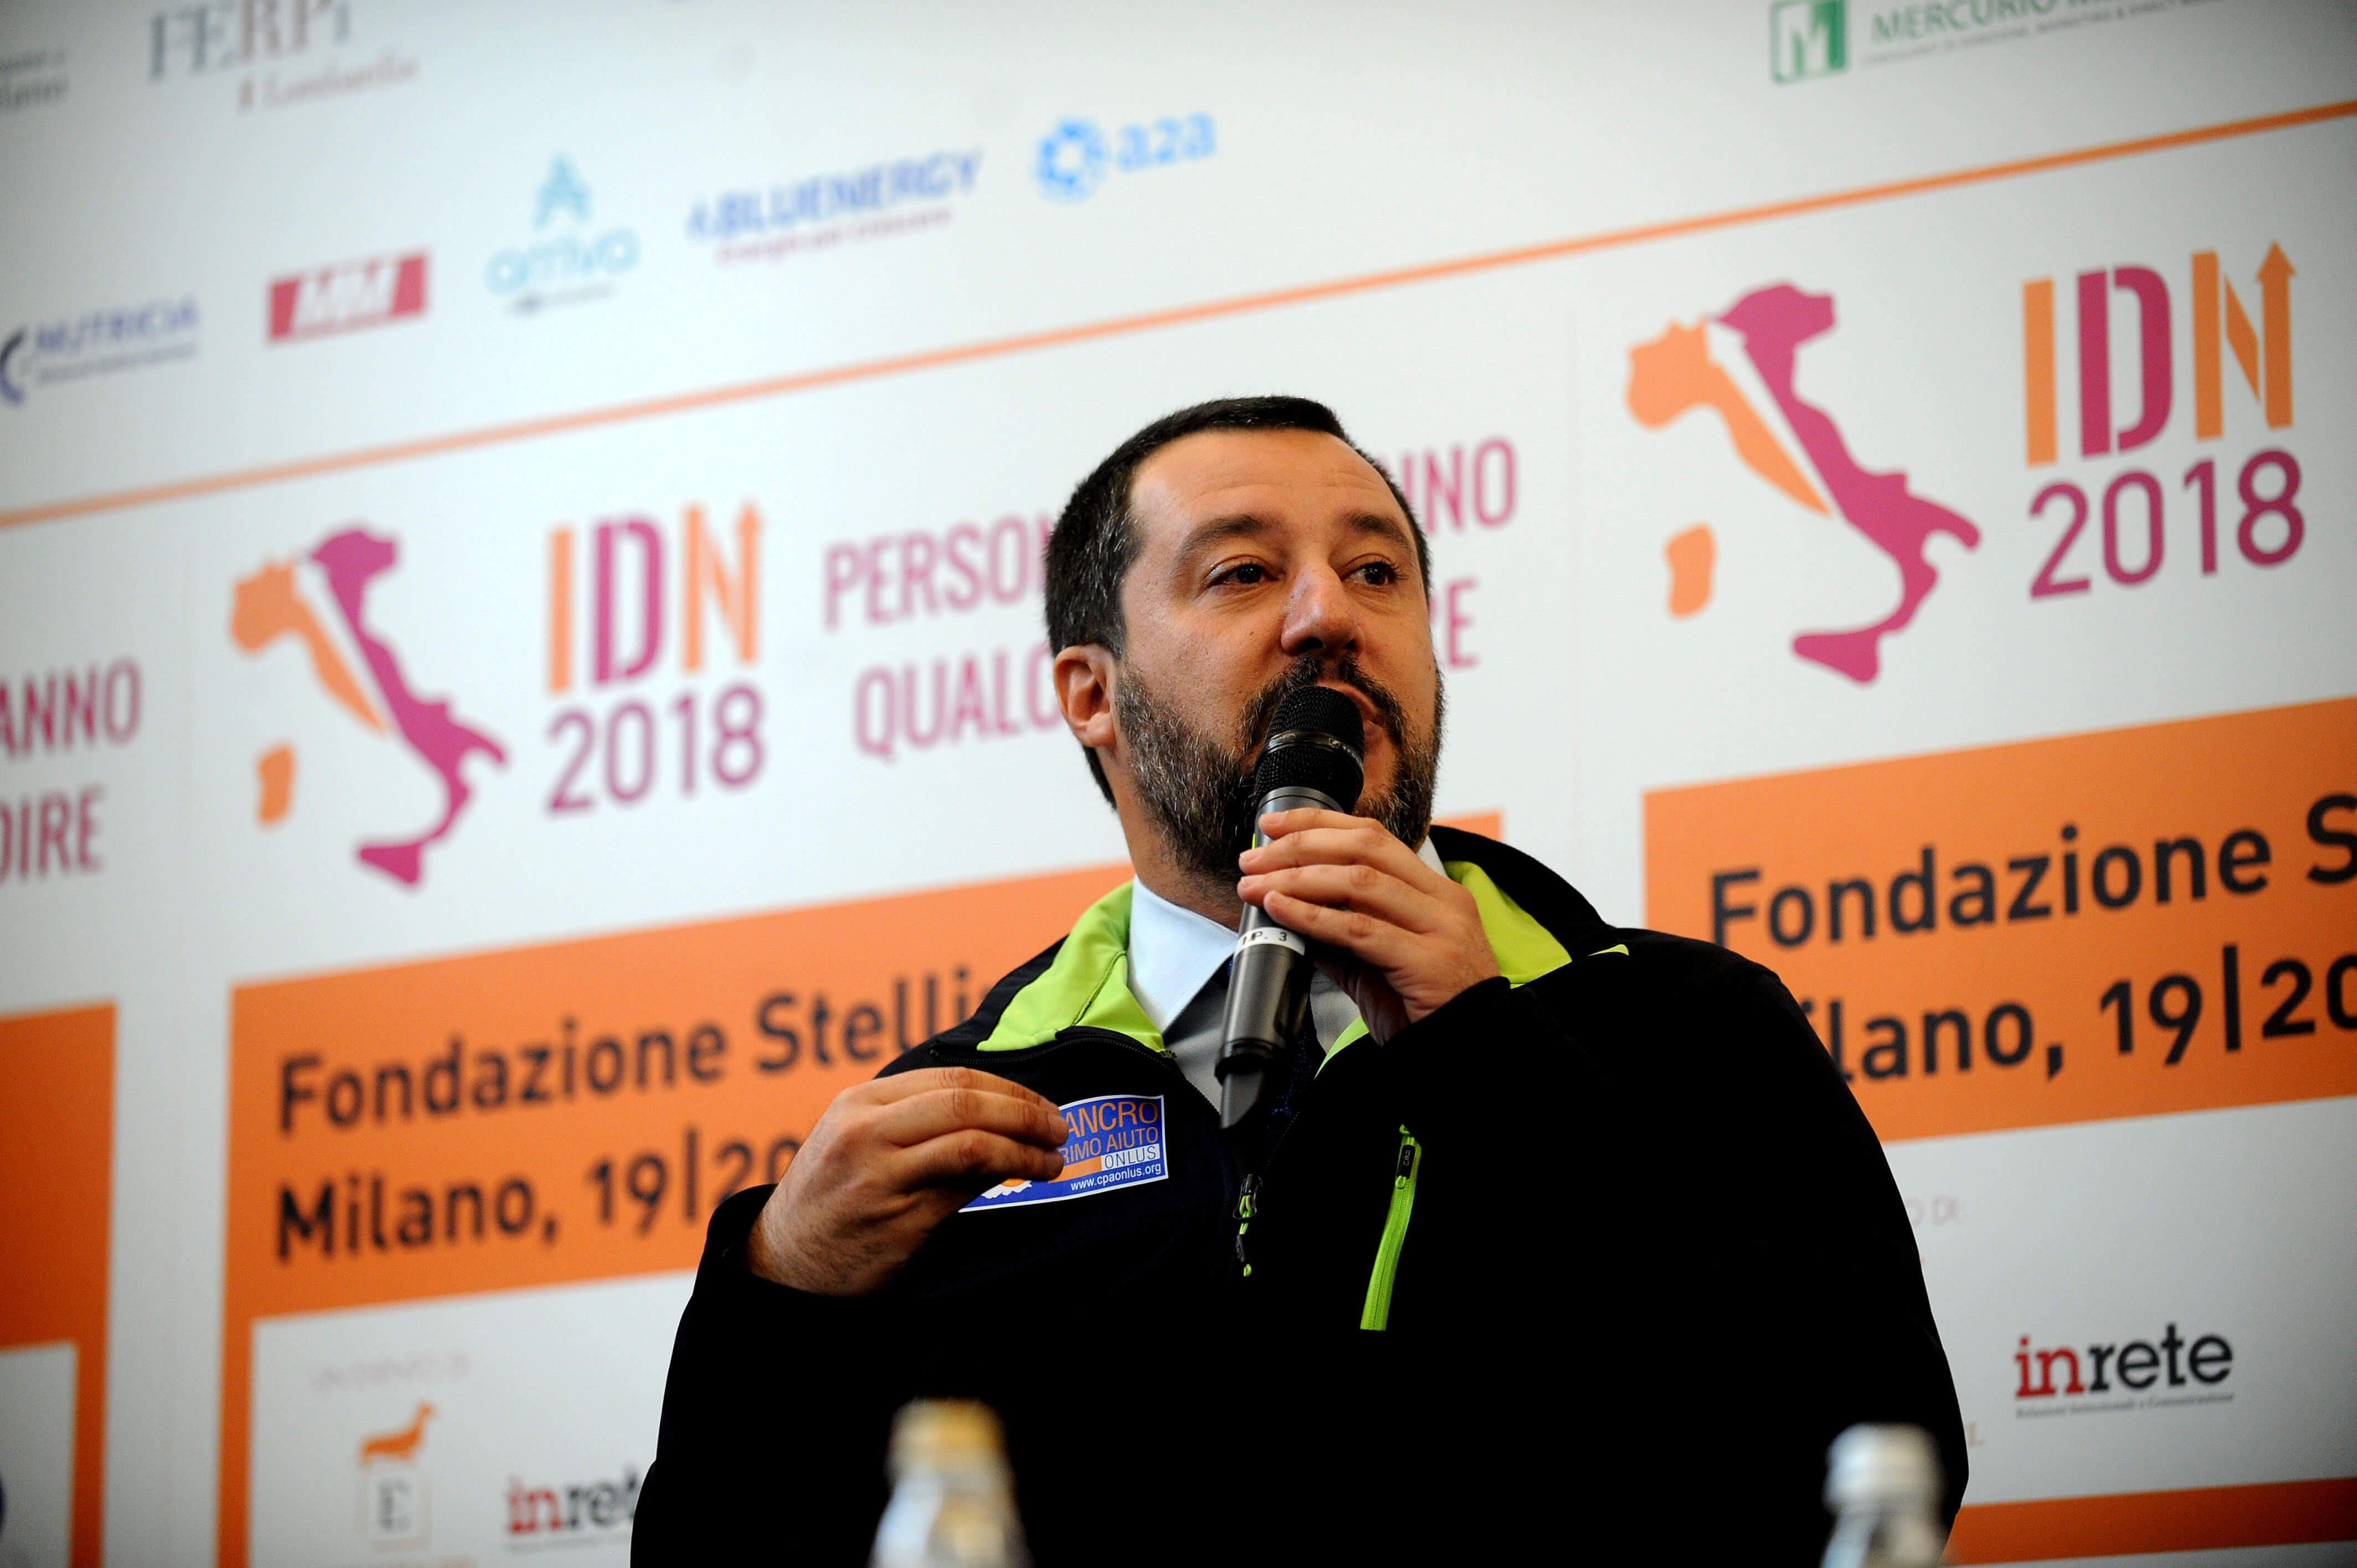 Salvini_Inrete_Idn_2018